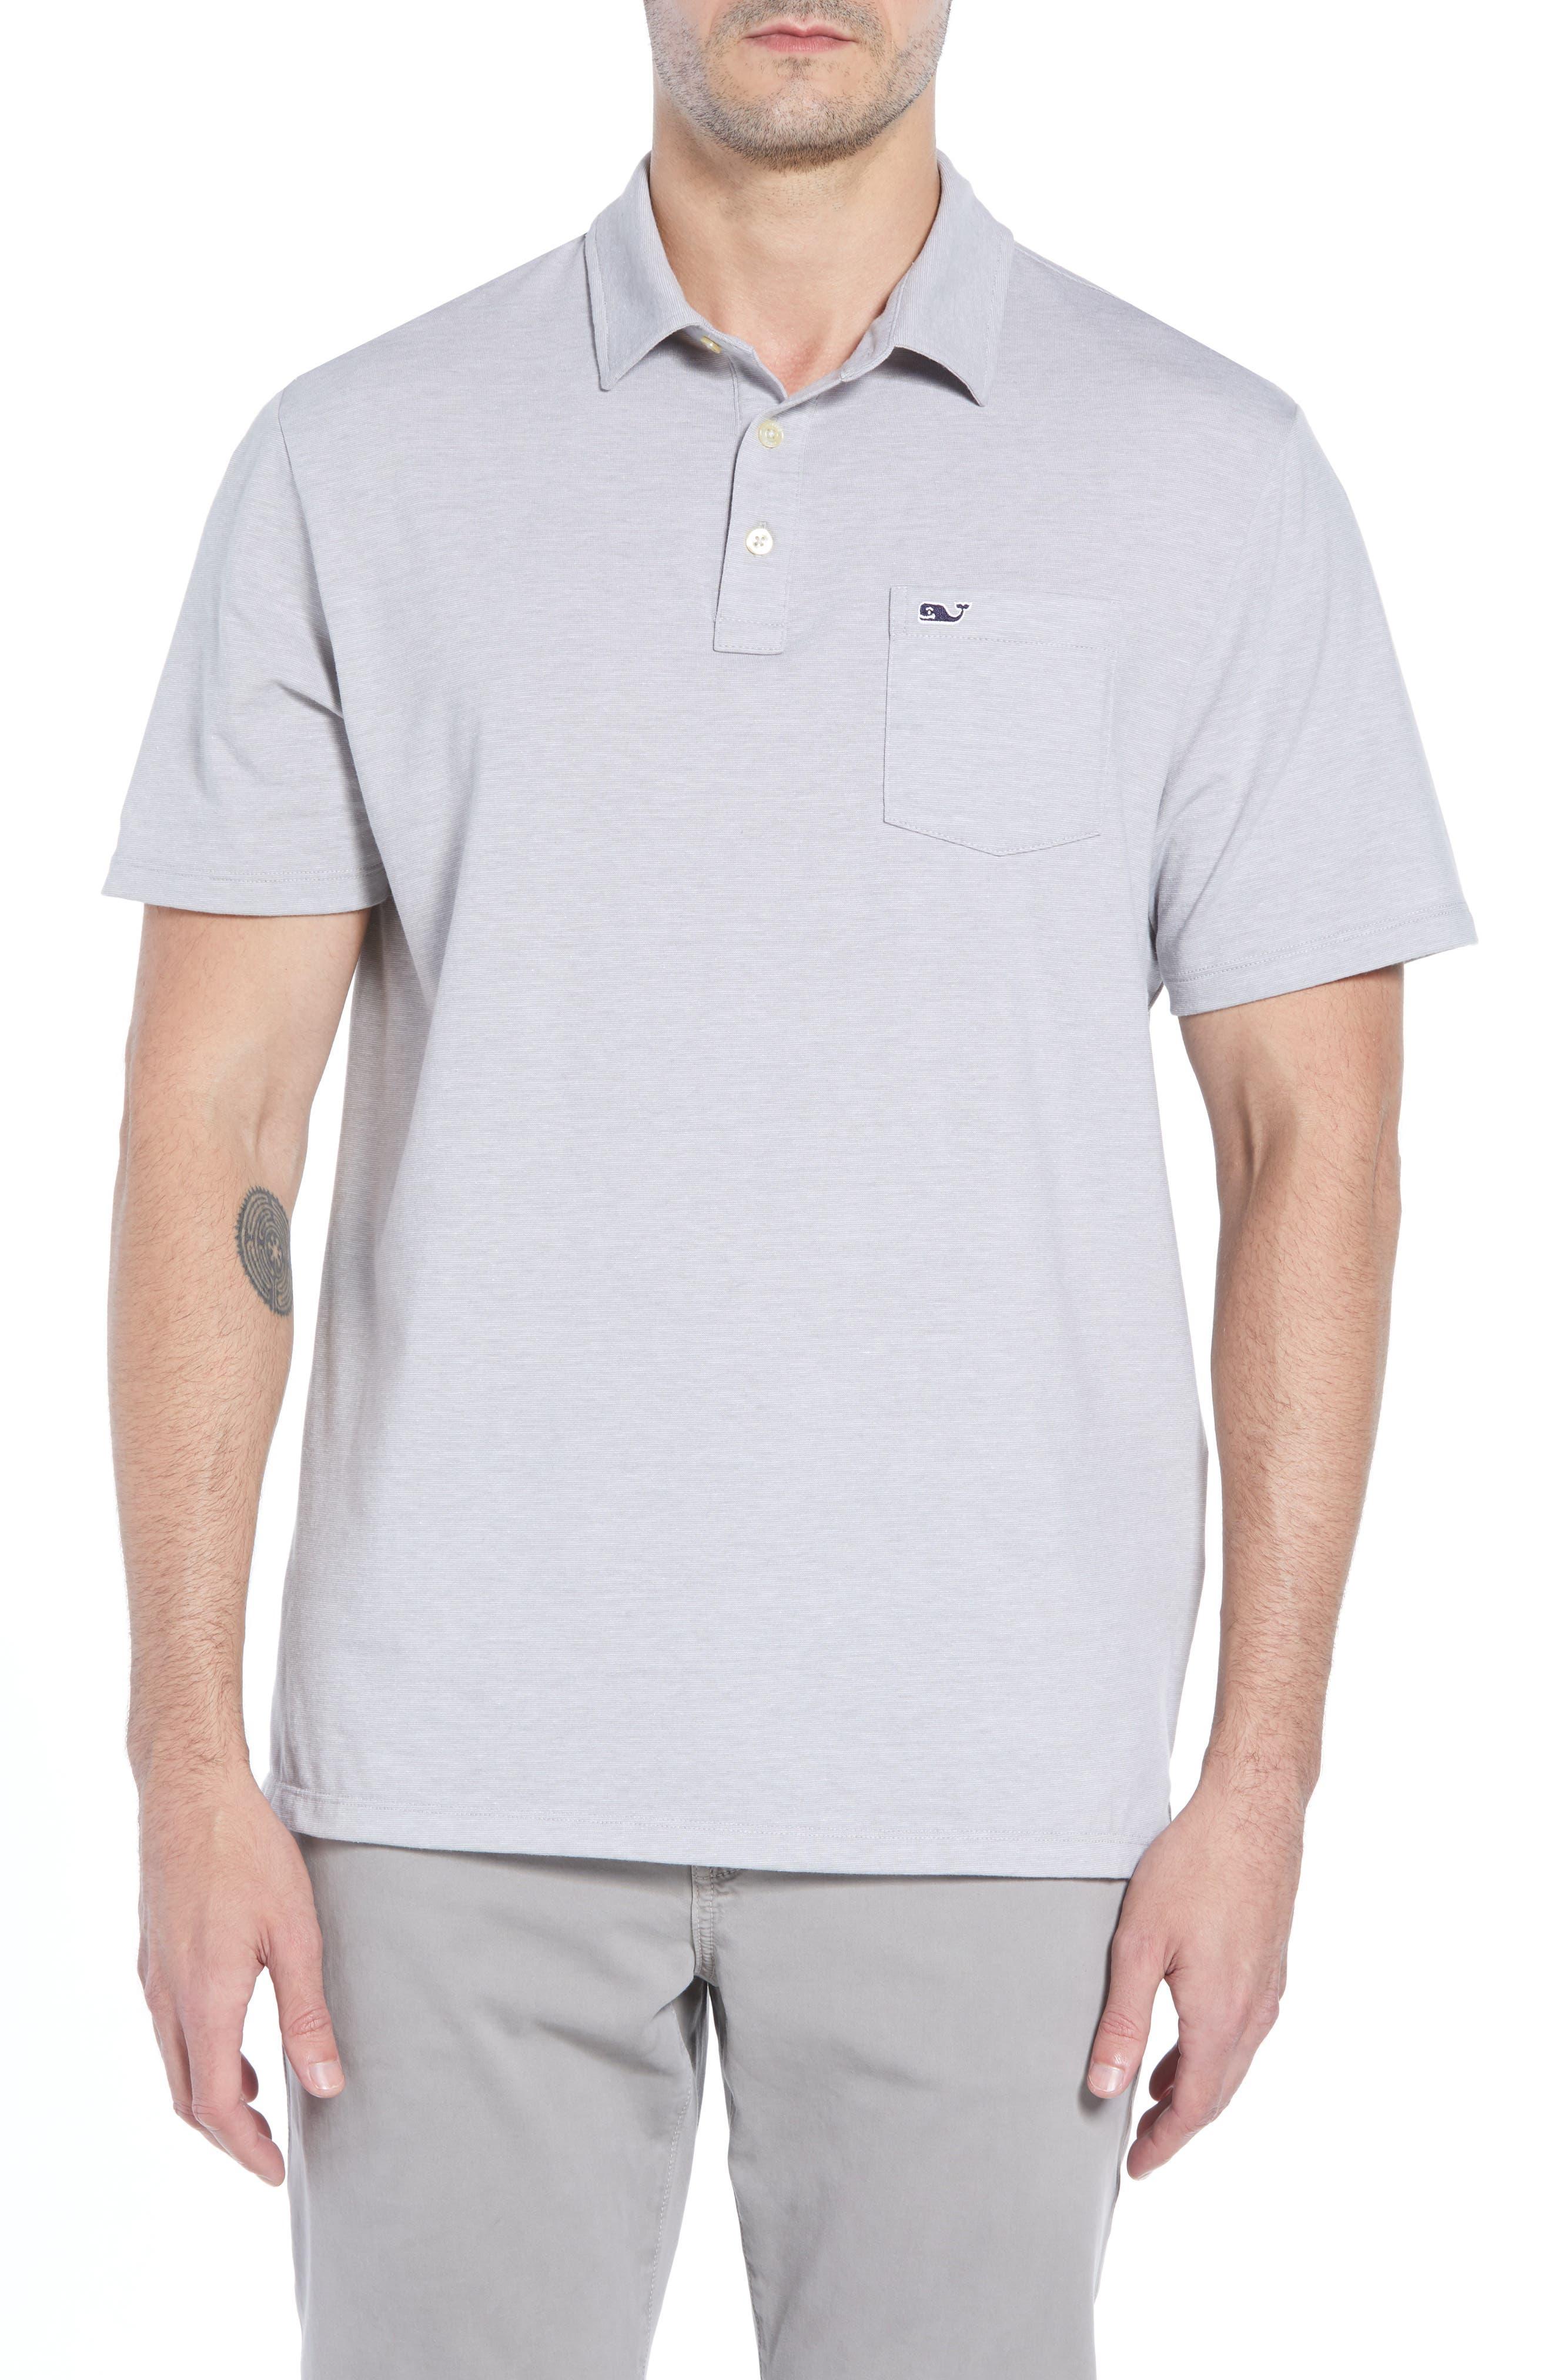 Edgartown Polo Shirt,                             Main thumbnail 1, color,                             MONUMENT GRAY